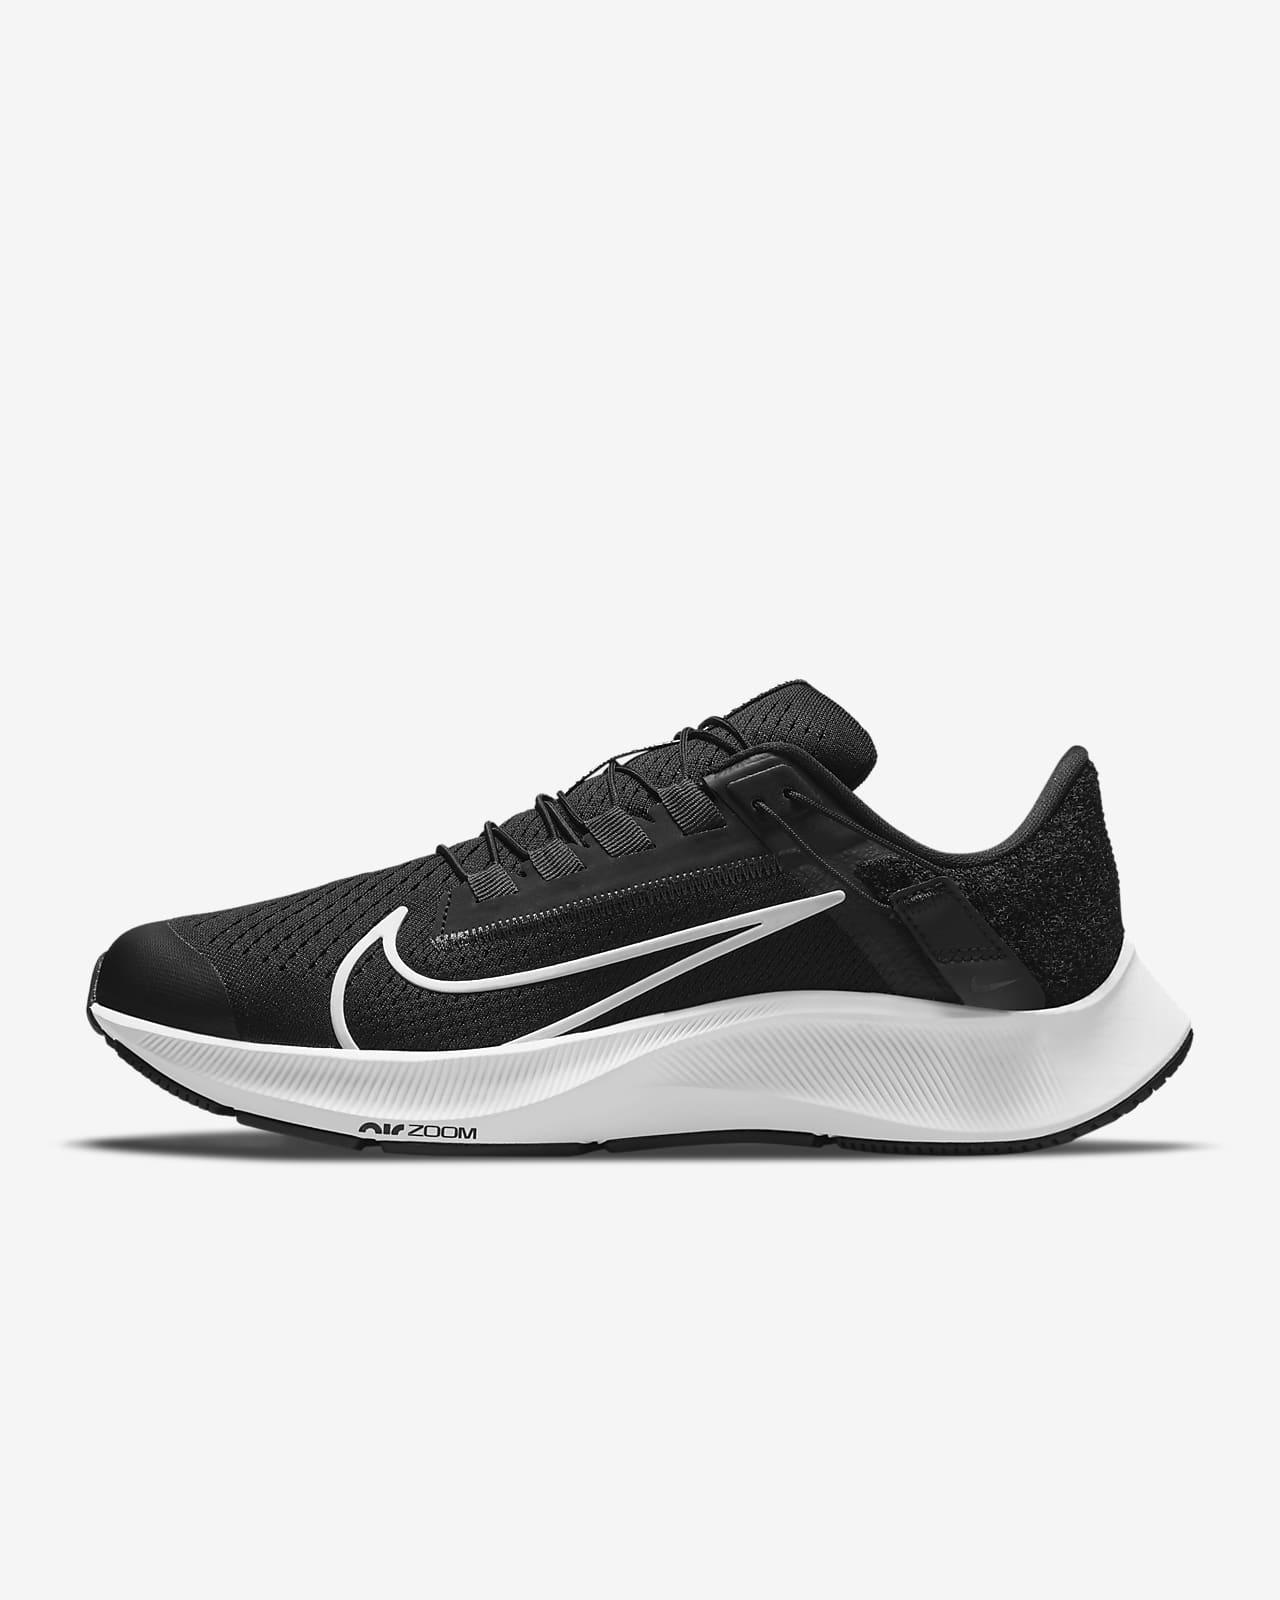 Sapatilhas de running Nike Air Zoom Pegasus 38 FlyEase para mulher